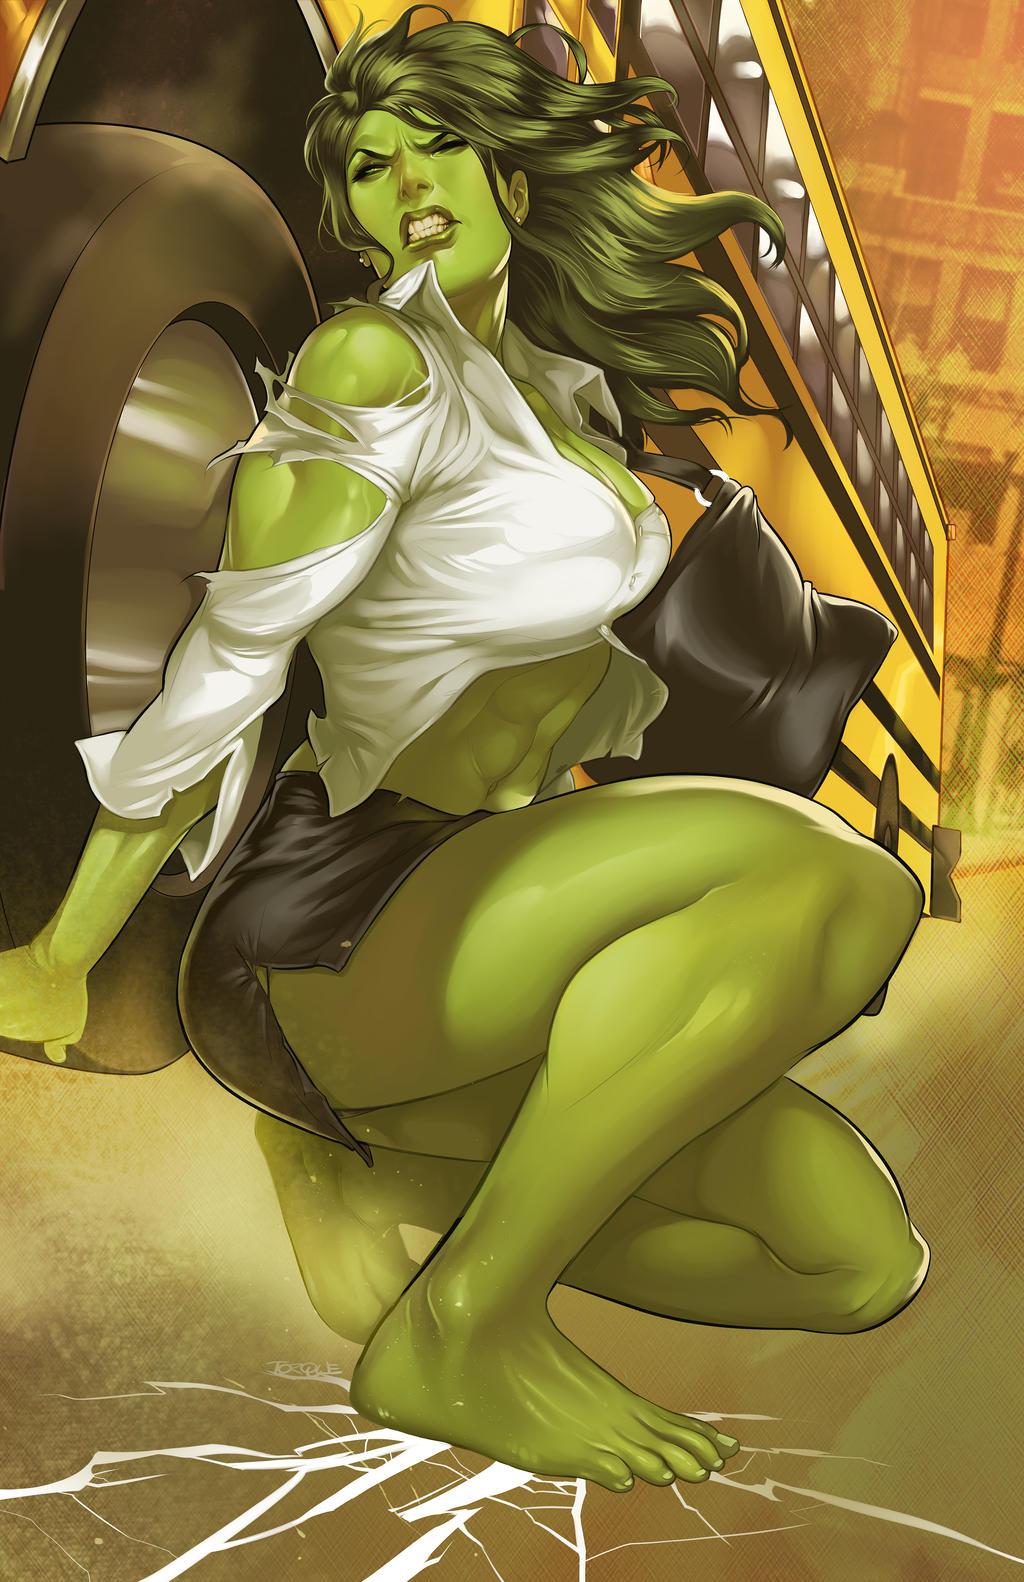 Sexy pics of she hulk